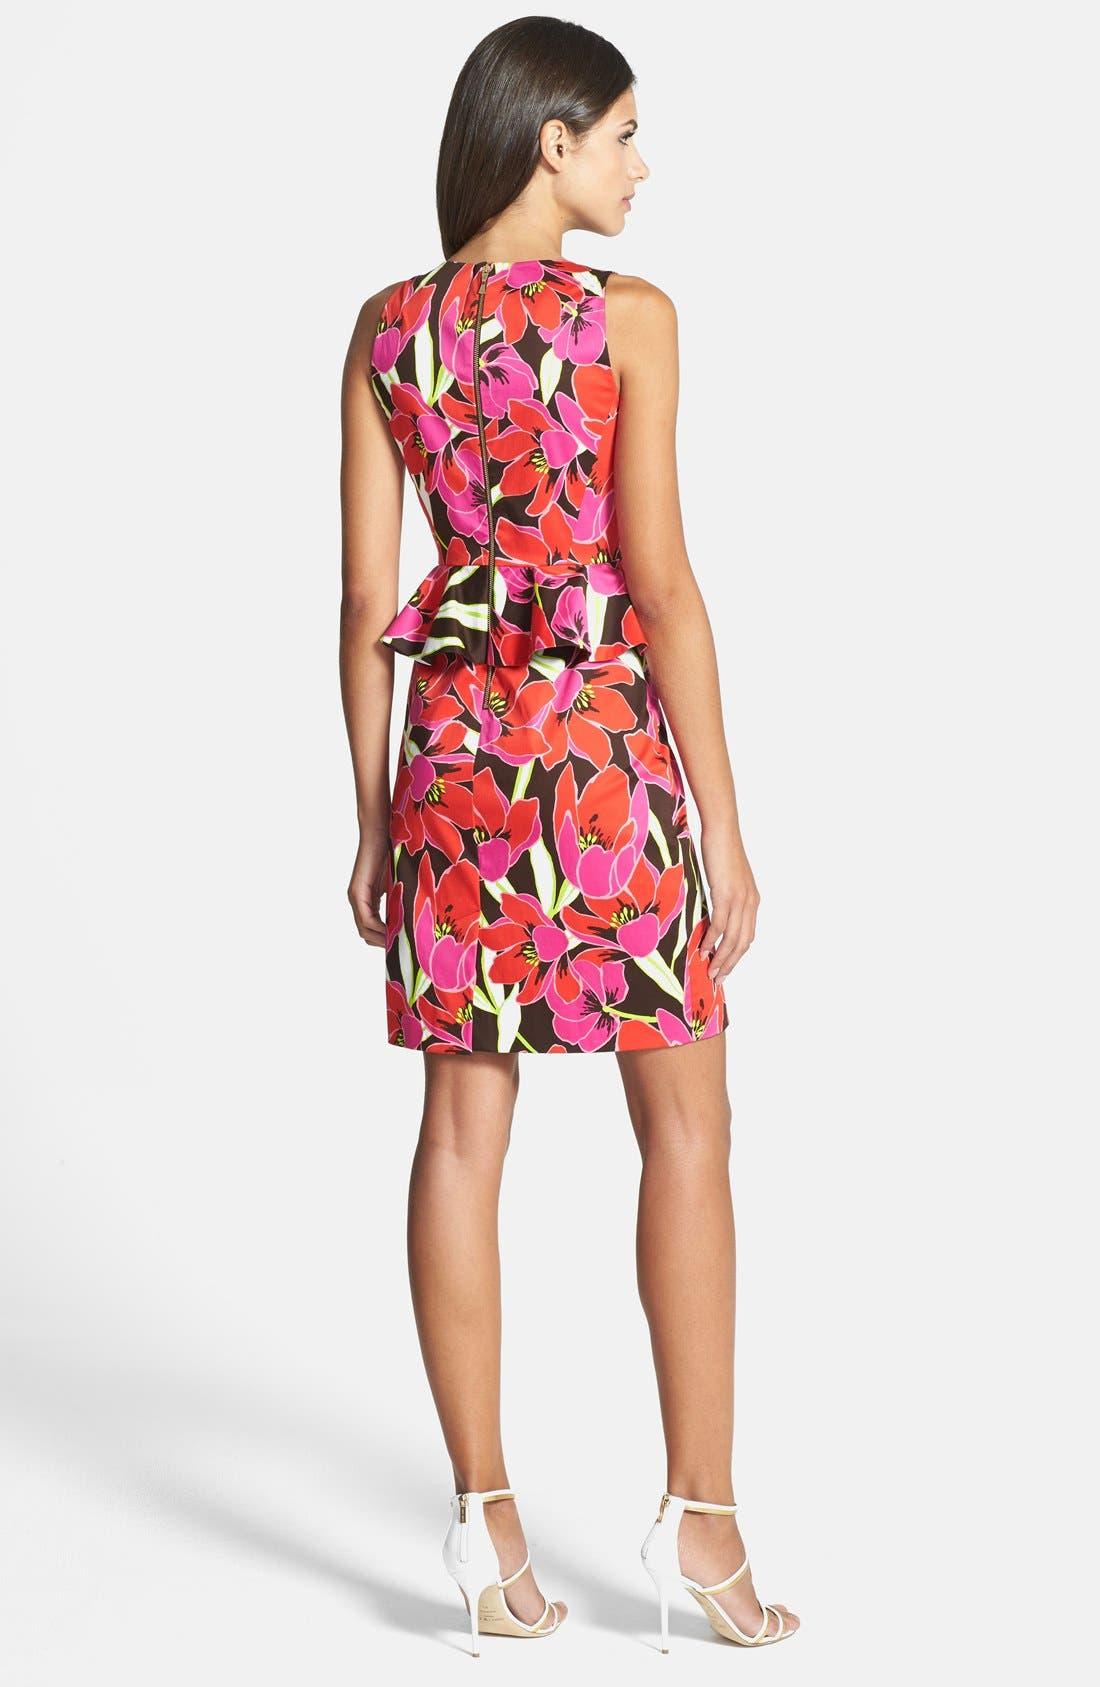 KATE SPADE NEW YORK,                             tropical print peplum sheath dress,                             Alternate thumbnail 2, color,                             650